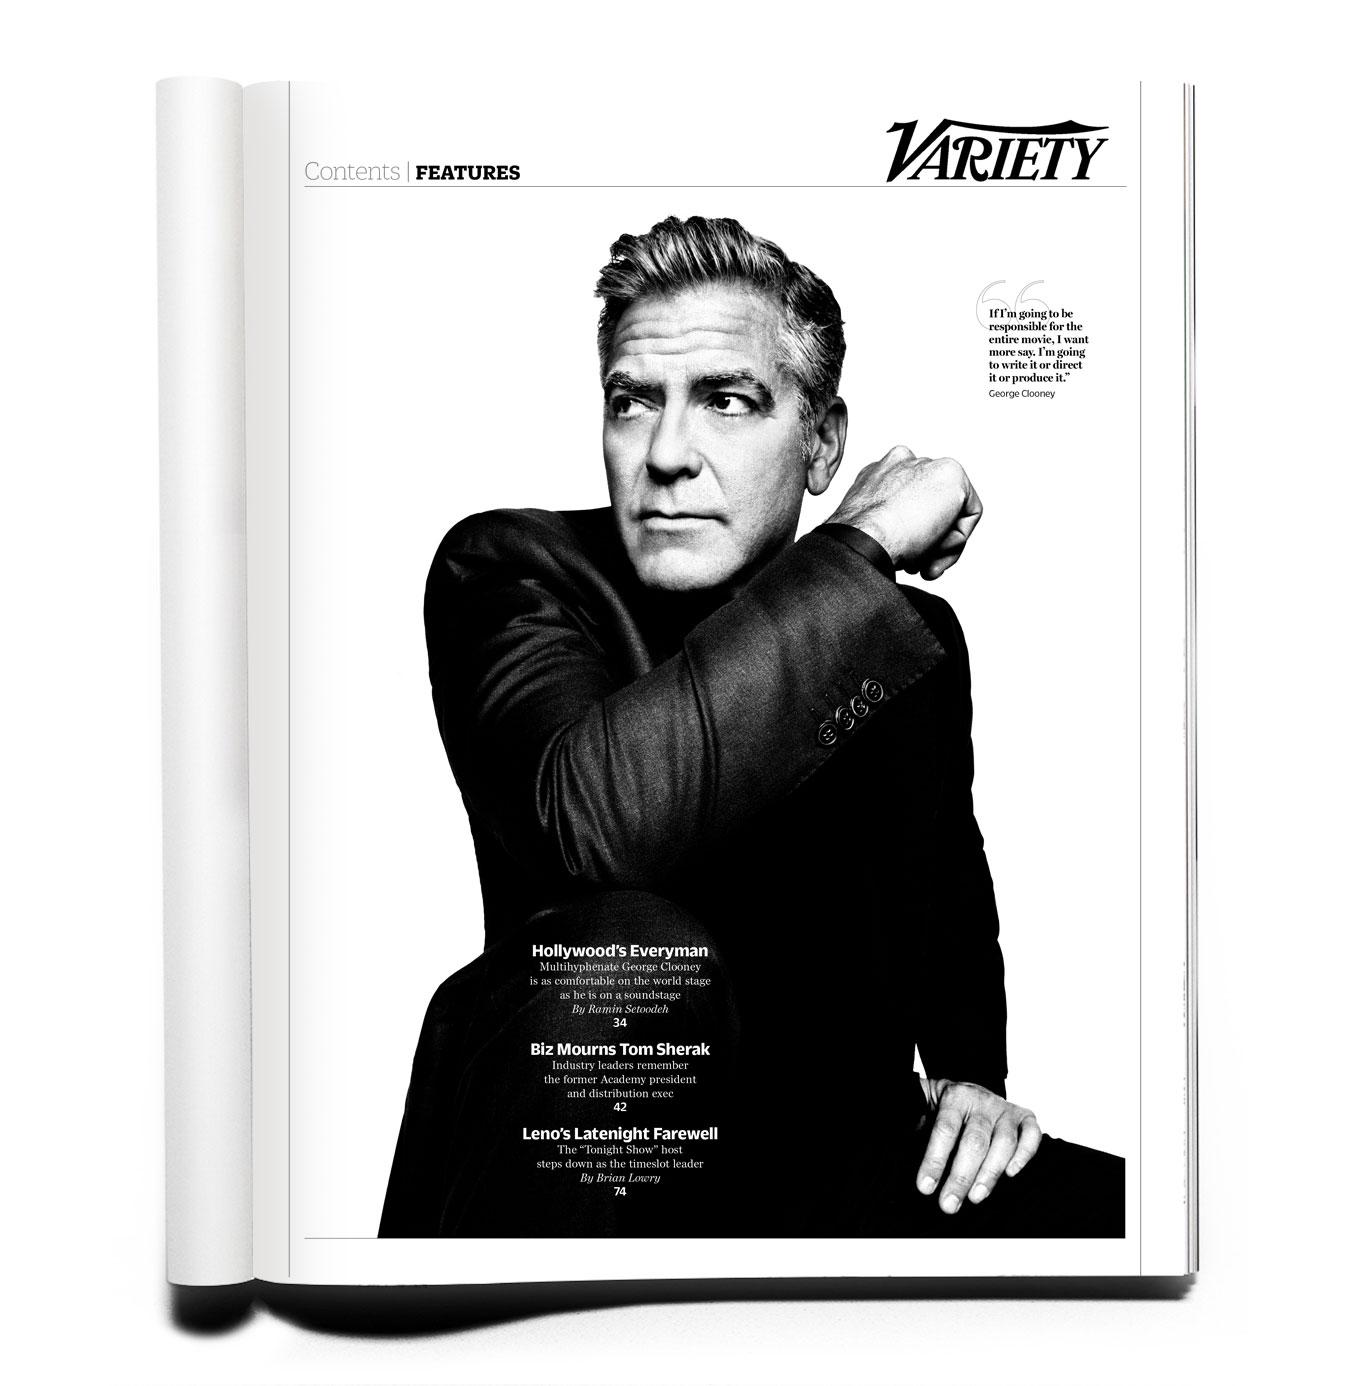 V_Singles_Clooney_TOC.jpg